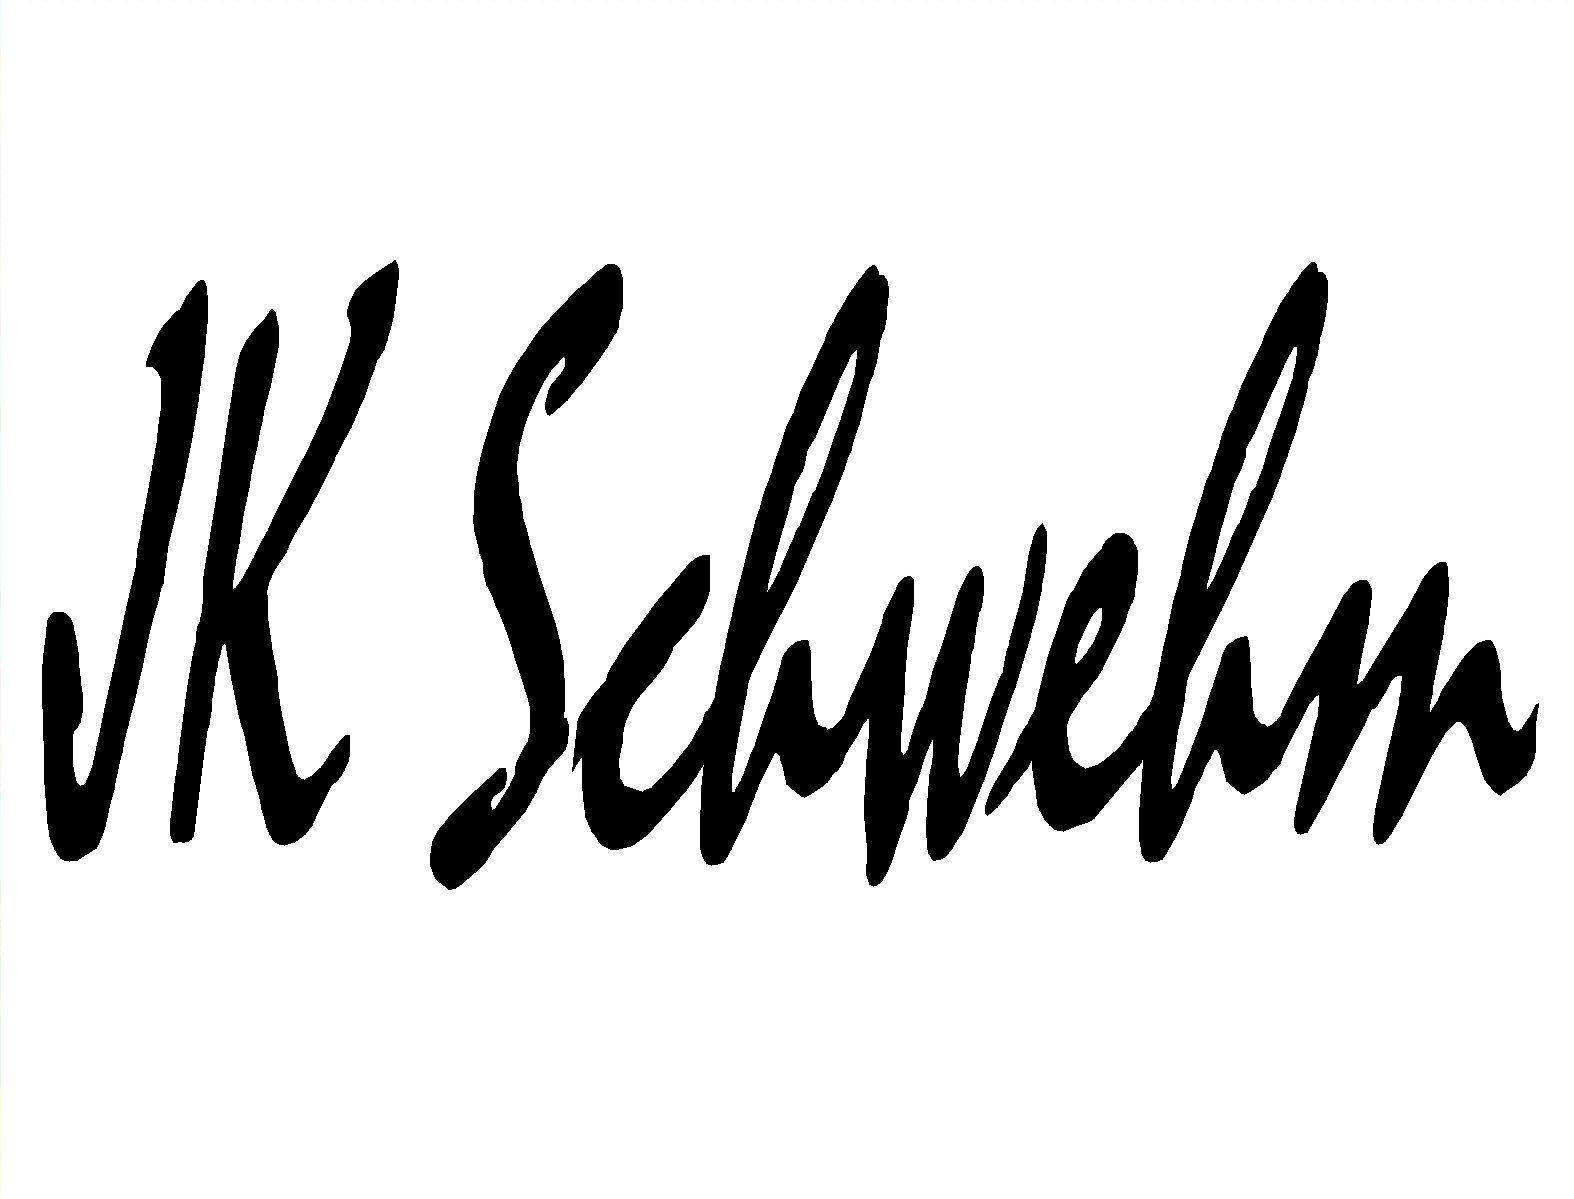 JK Schwehm's Signature